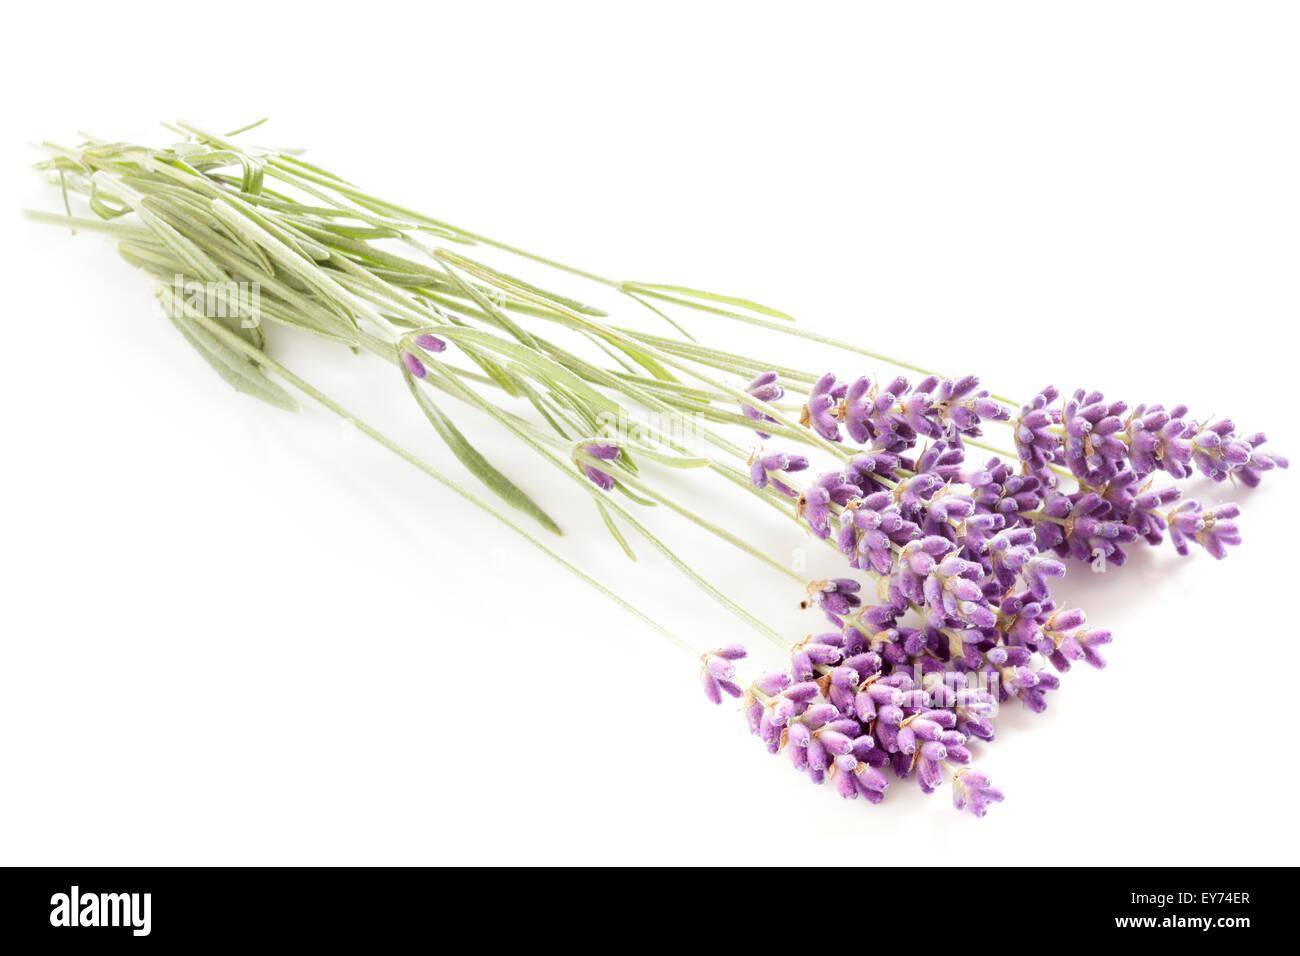 Lavender flowers - Stock Image